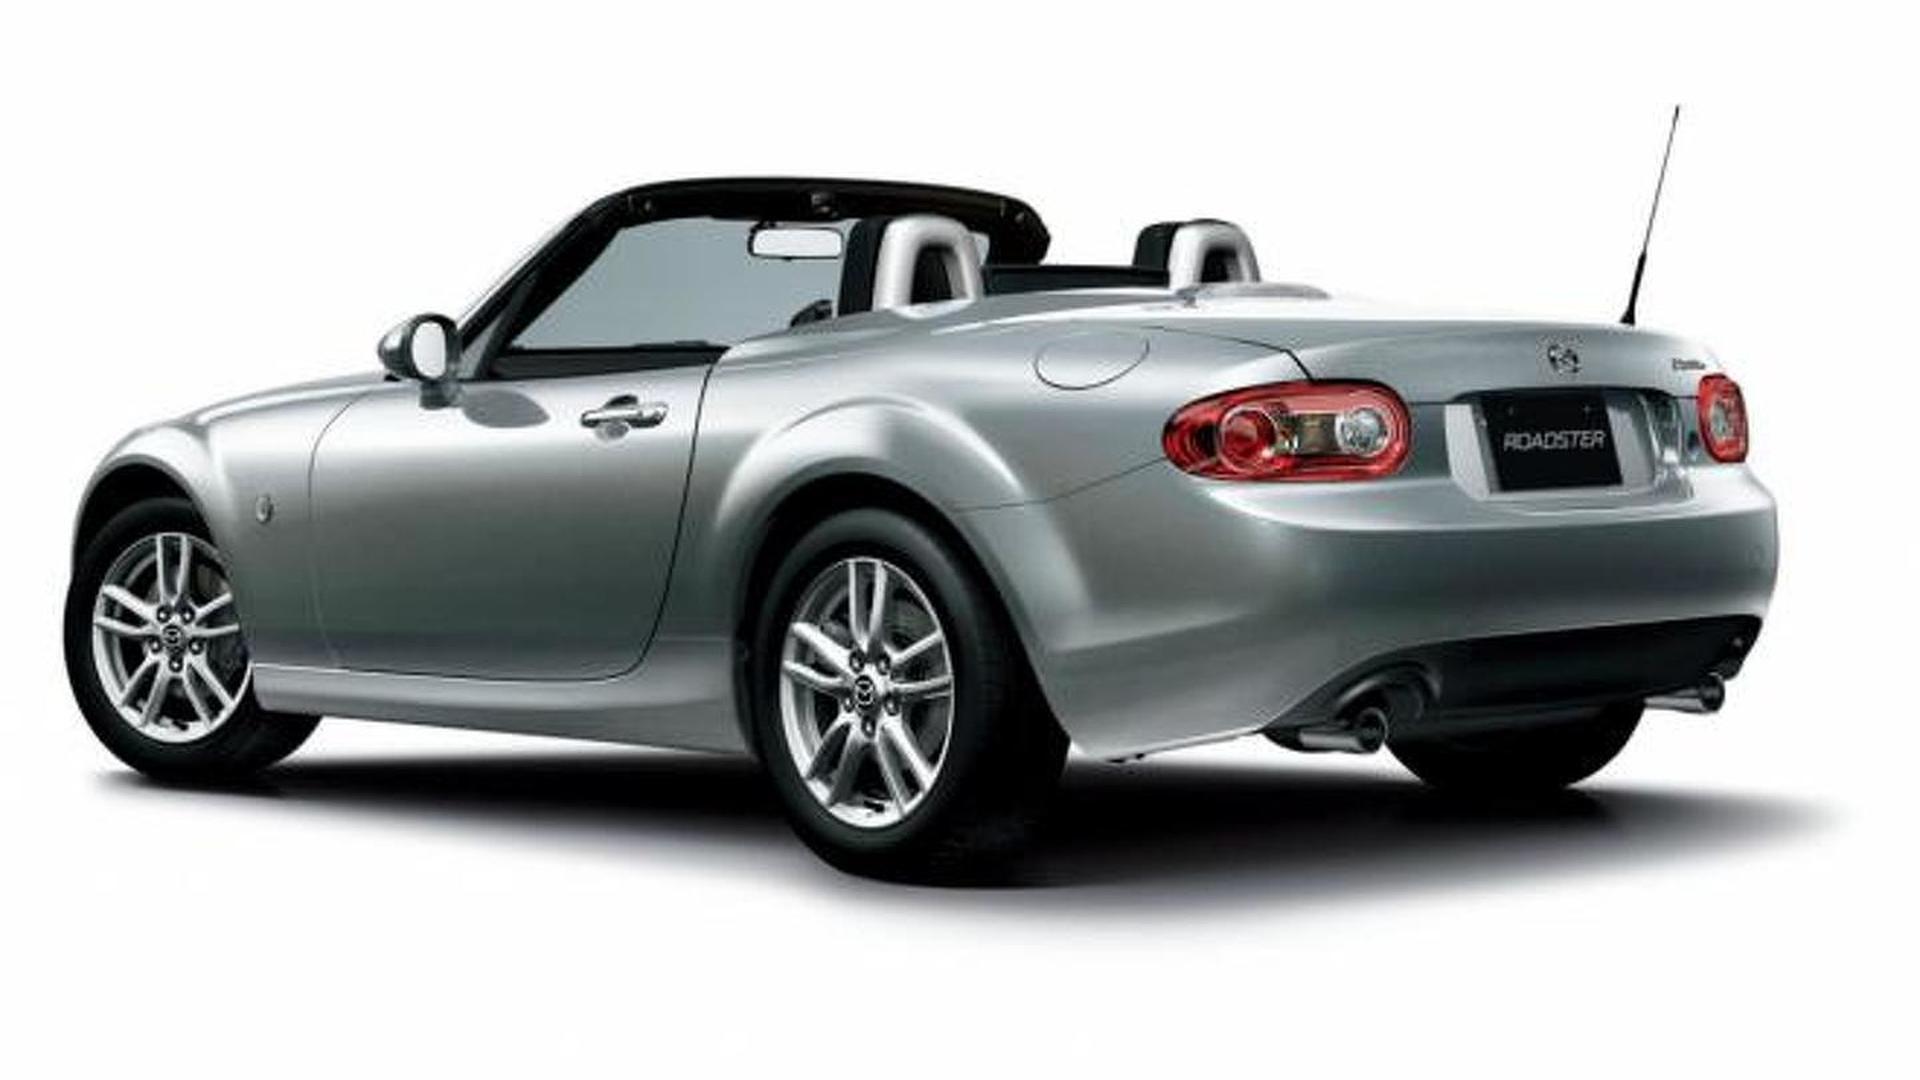 https://icdn-6.motor1.com/images/mgl/EY7qq/s1/2012-322484-2013-mazda-mx-5-facelift-05-07-20121.jpg